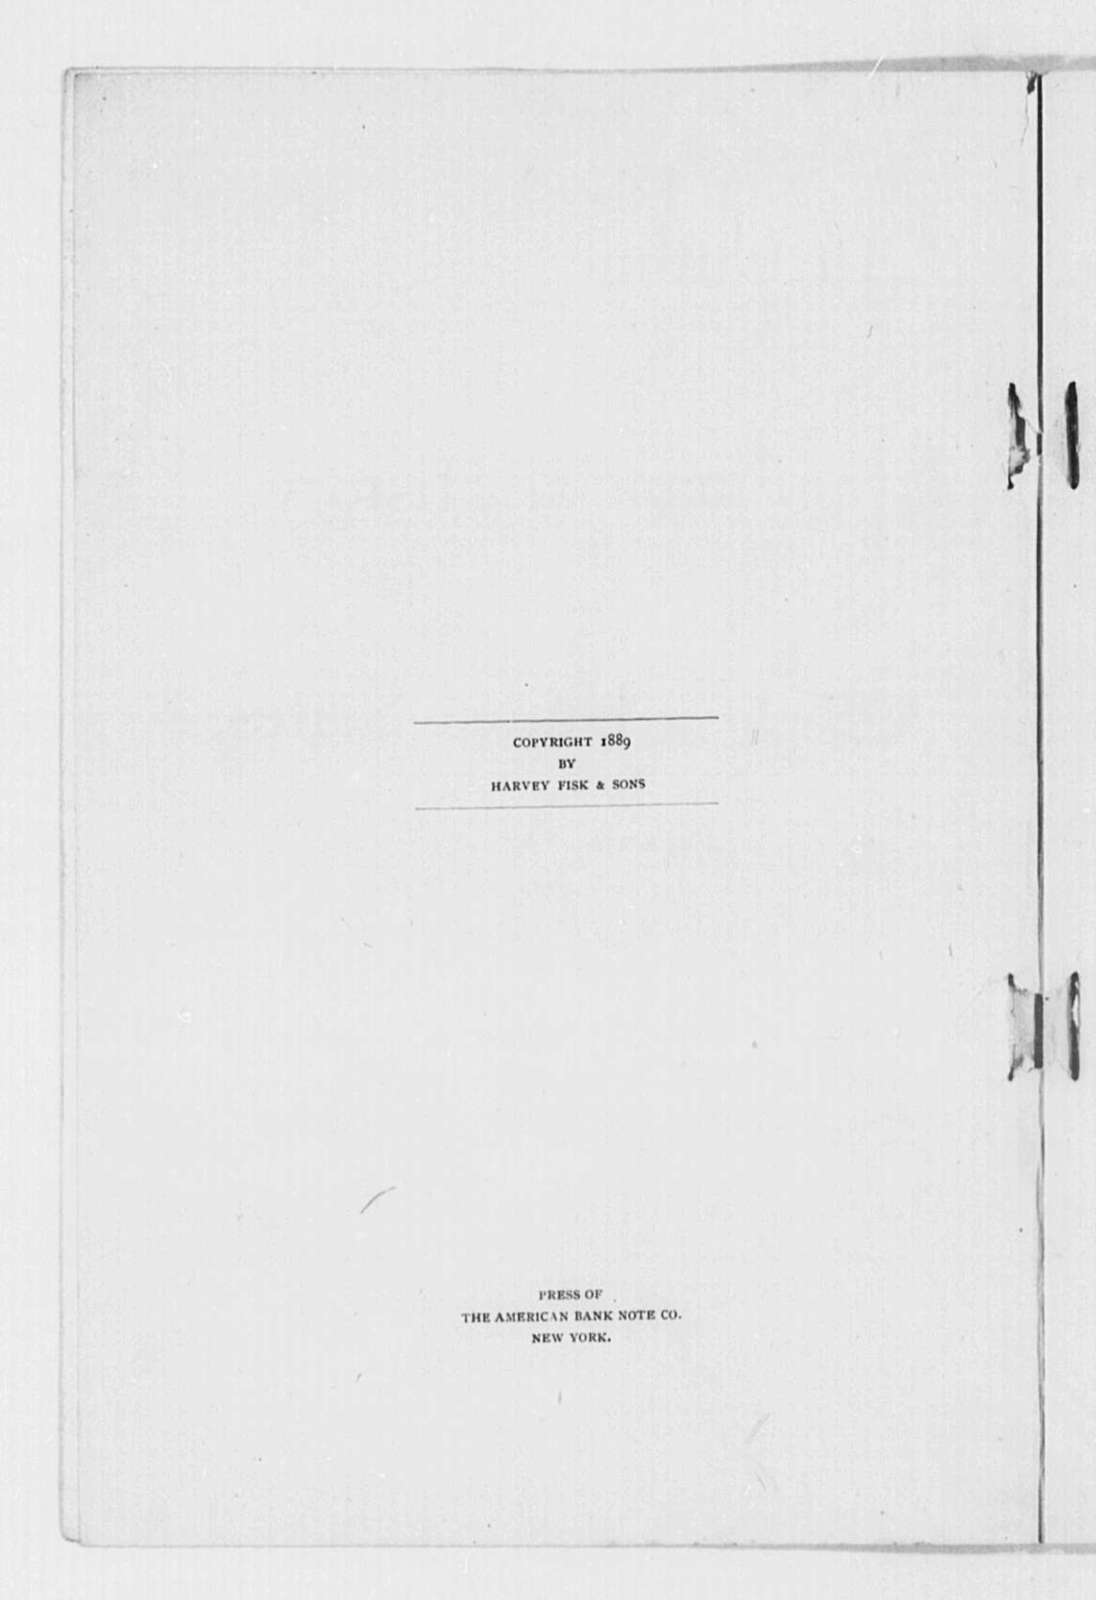 Https Media Soupers De La Cour Vol 2 667 2018 09 11t23 Osage Warrior Ambulance Wiring Diagram United States Financial History 1789 1889 1600